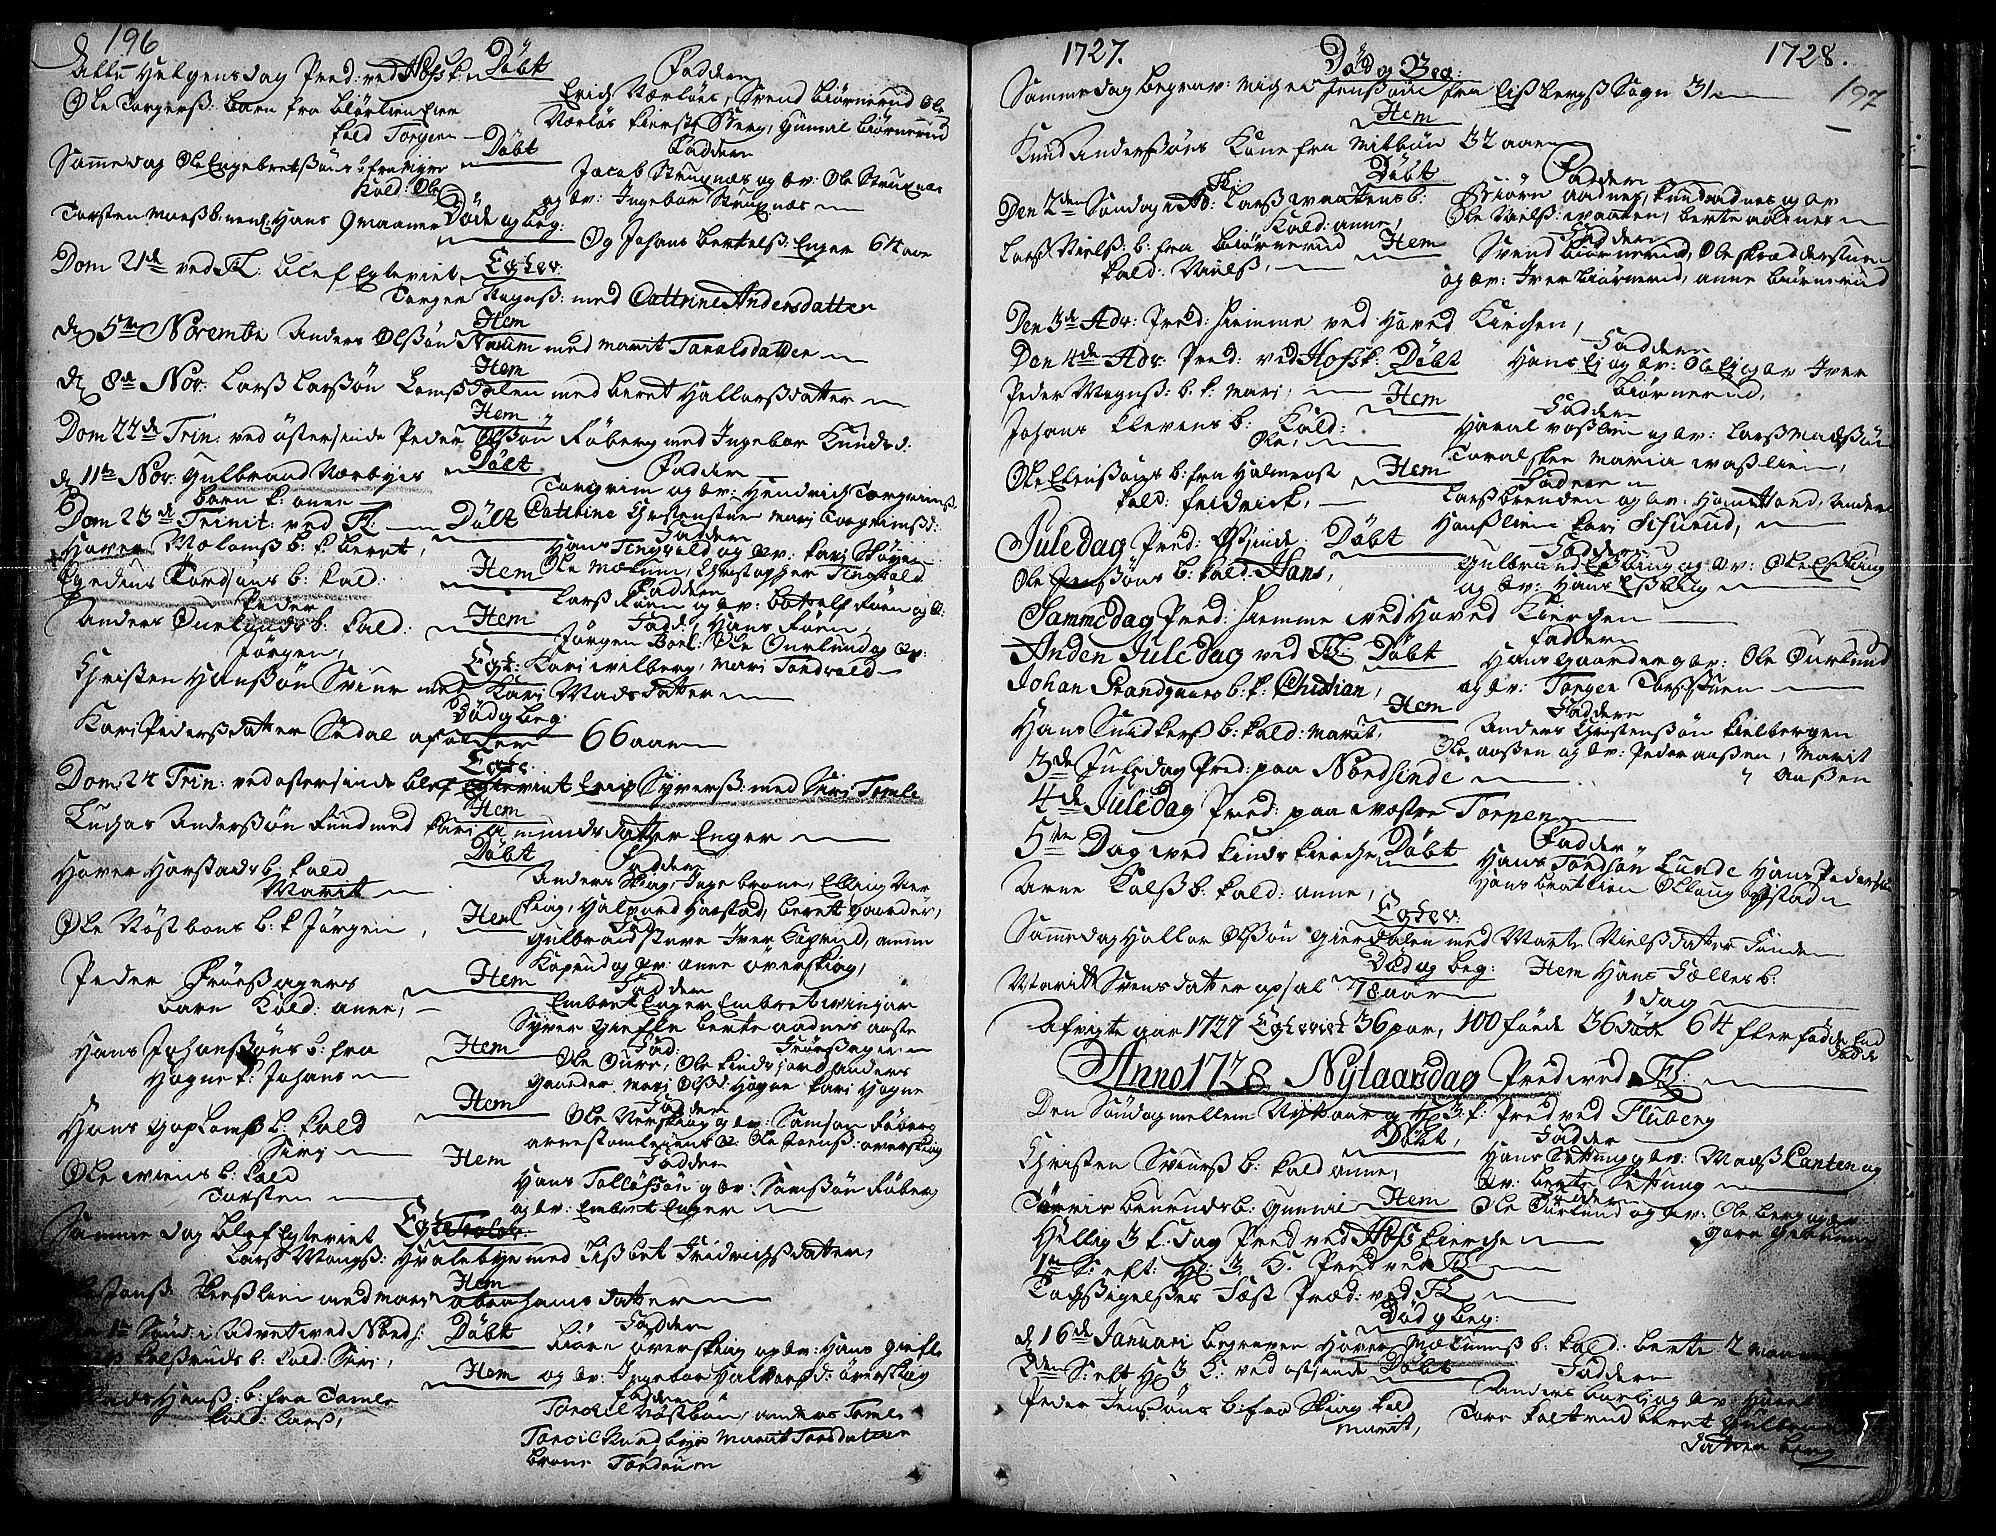 SAH, Land prestekontor, Ministerialbok nr. 1, 1708-1732, s. 196-197